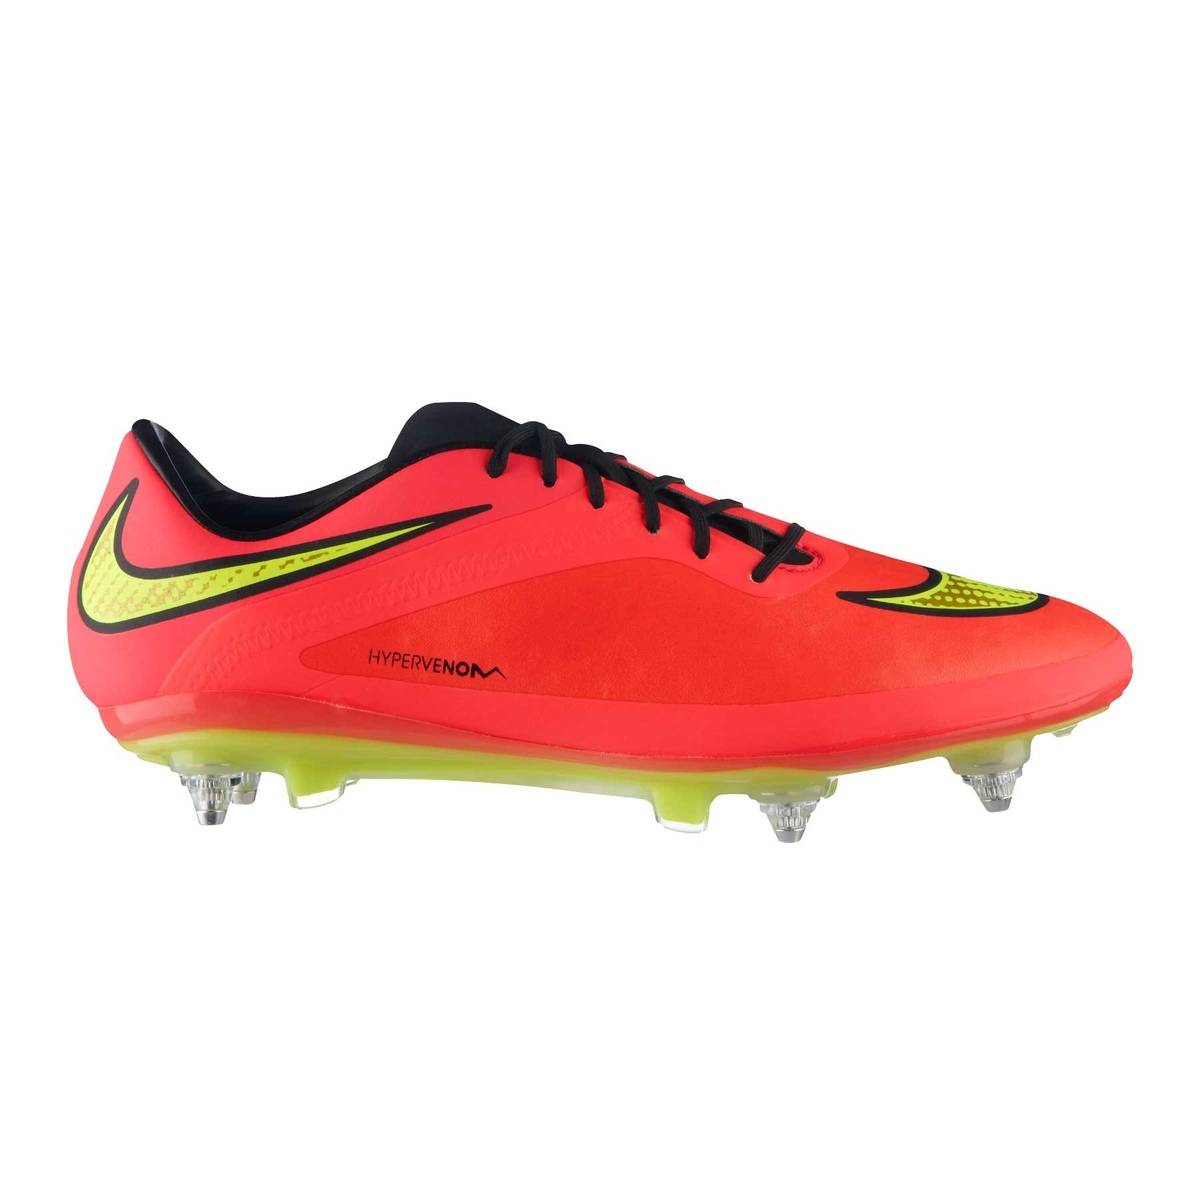 Nike Hypervenom phatal sg-pro